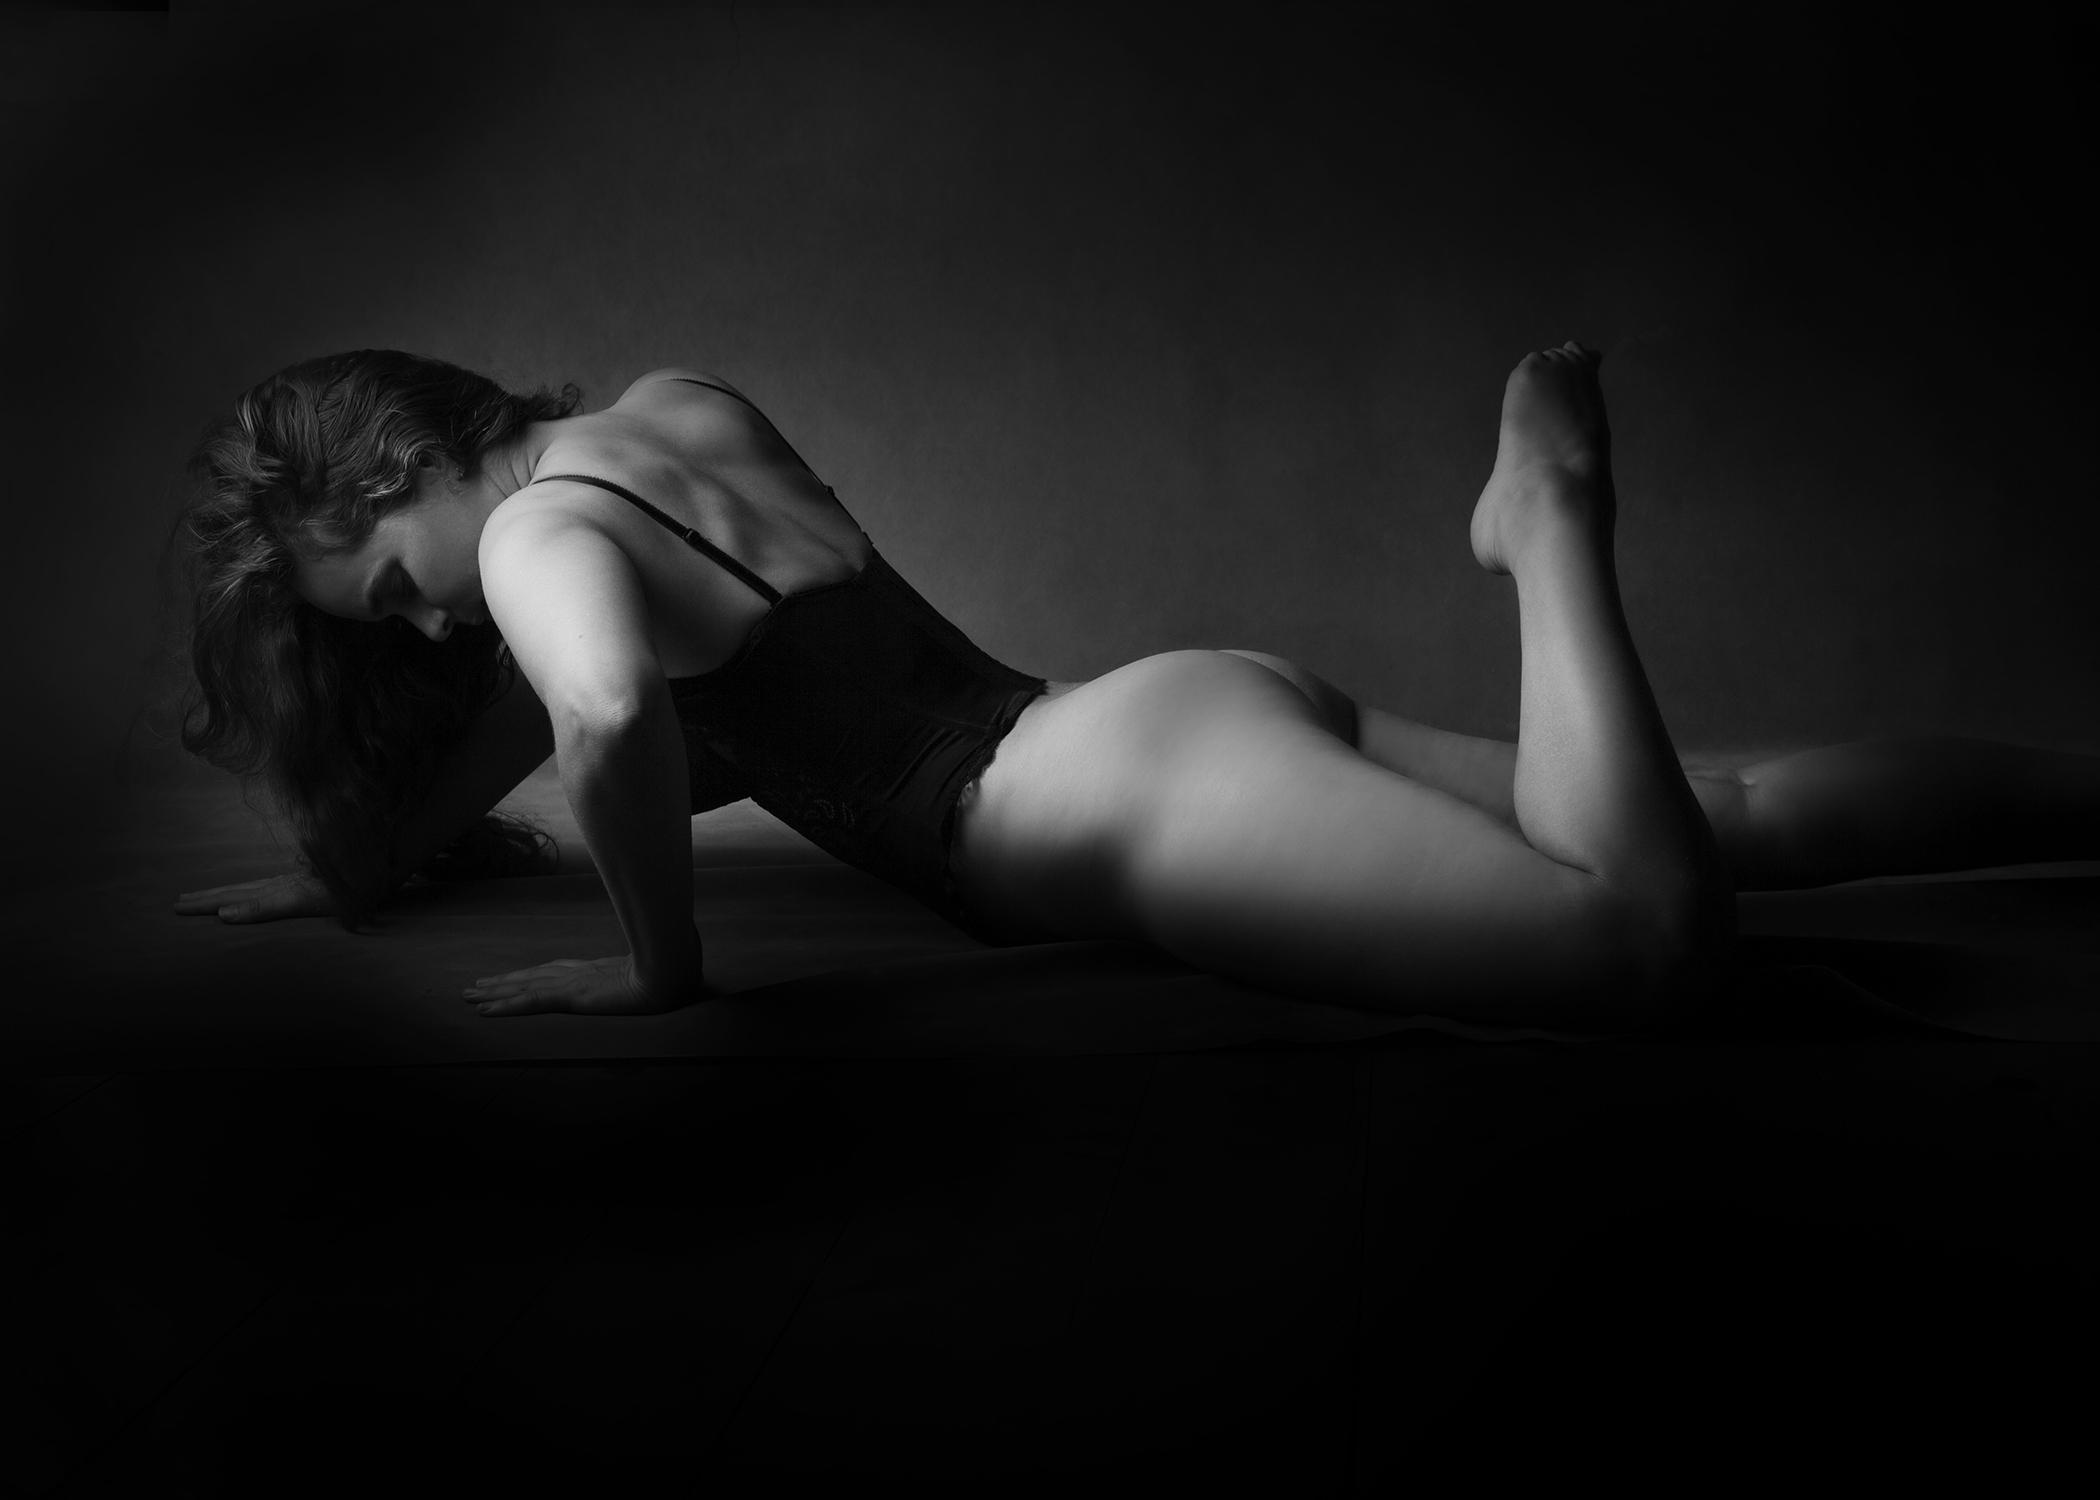 Lioness-Boudoir-Photography-3